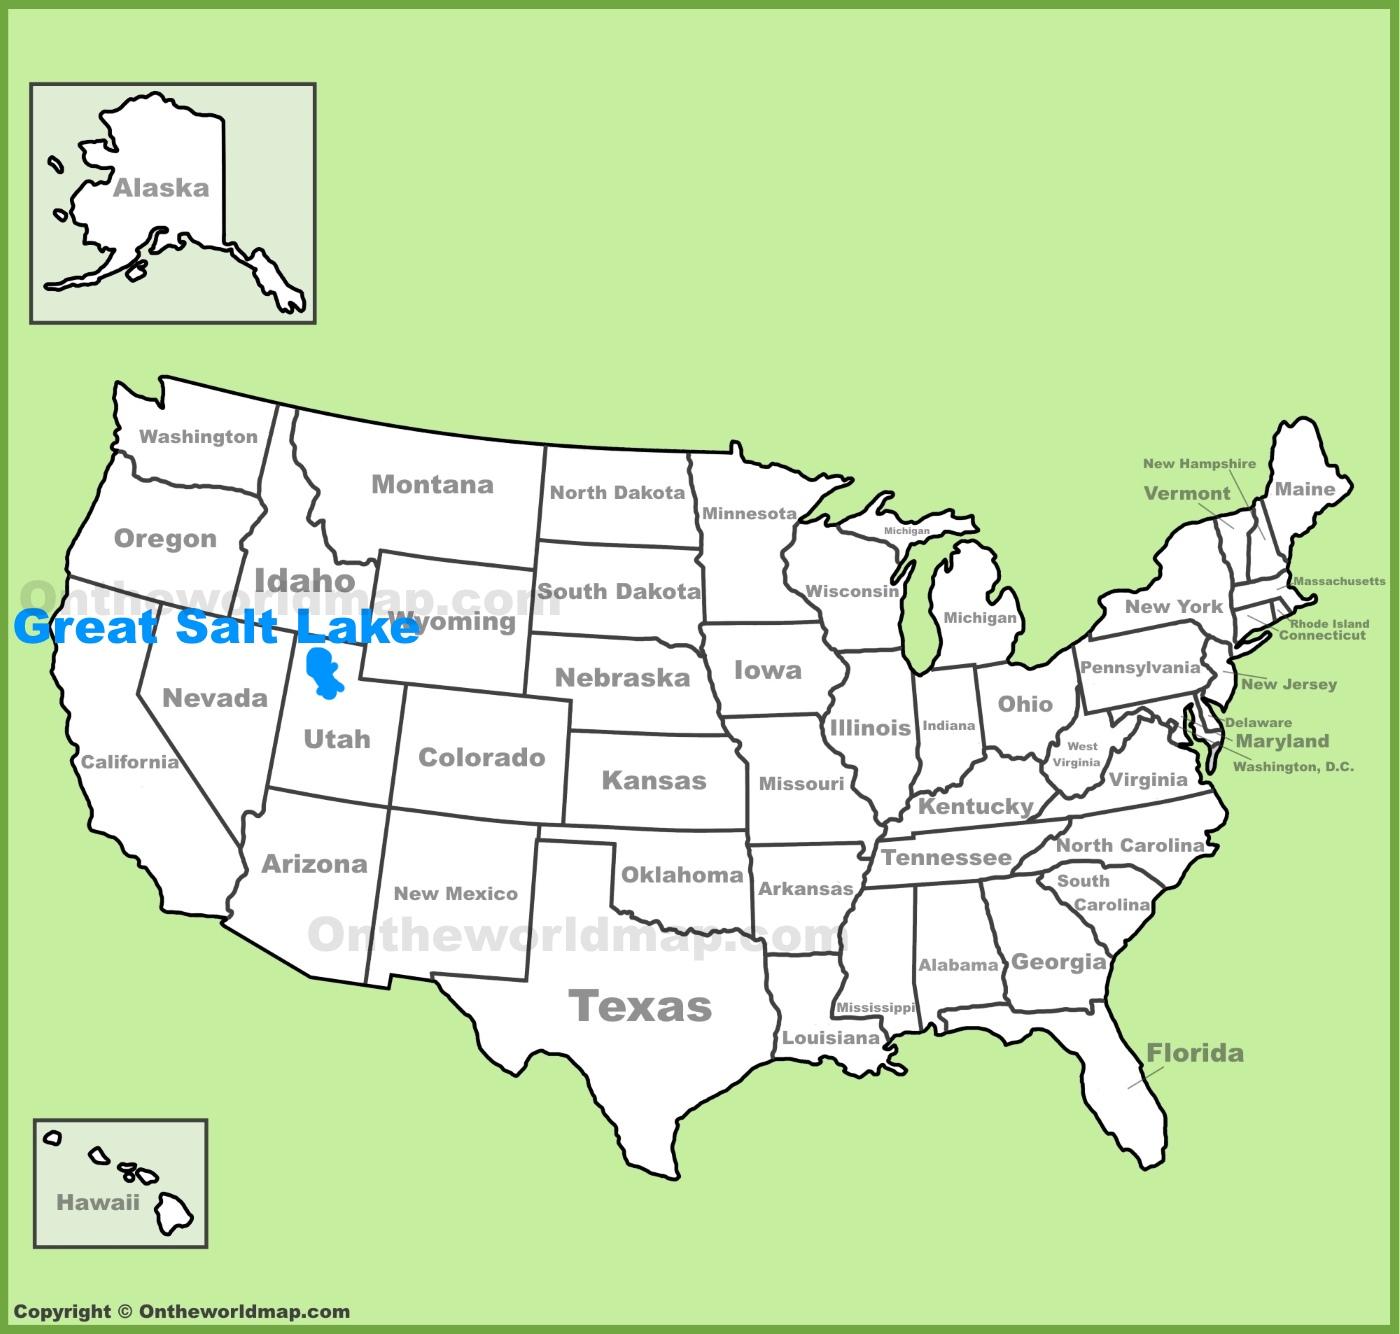 Great Salt Lake Map Great Salt Lake Maps   Maps of Great Salt Lake Great Salt Lake Map